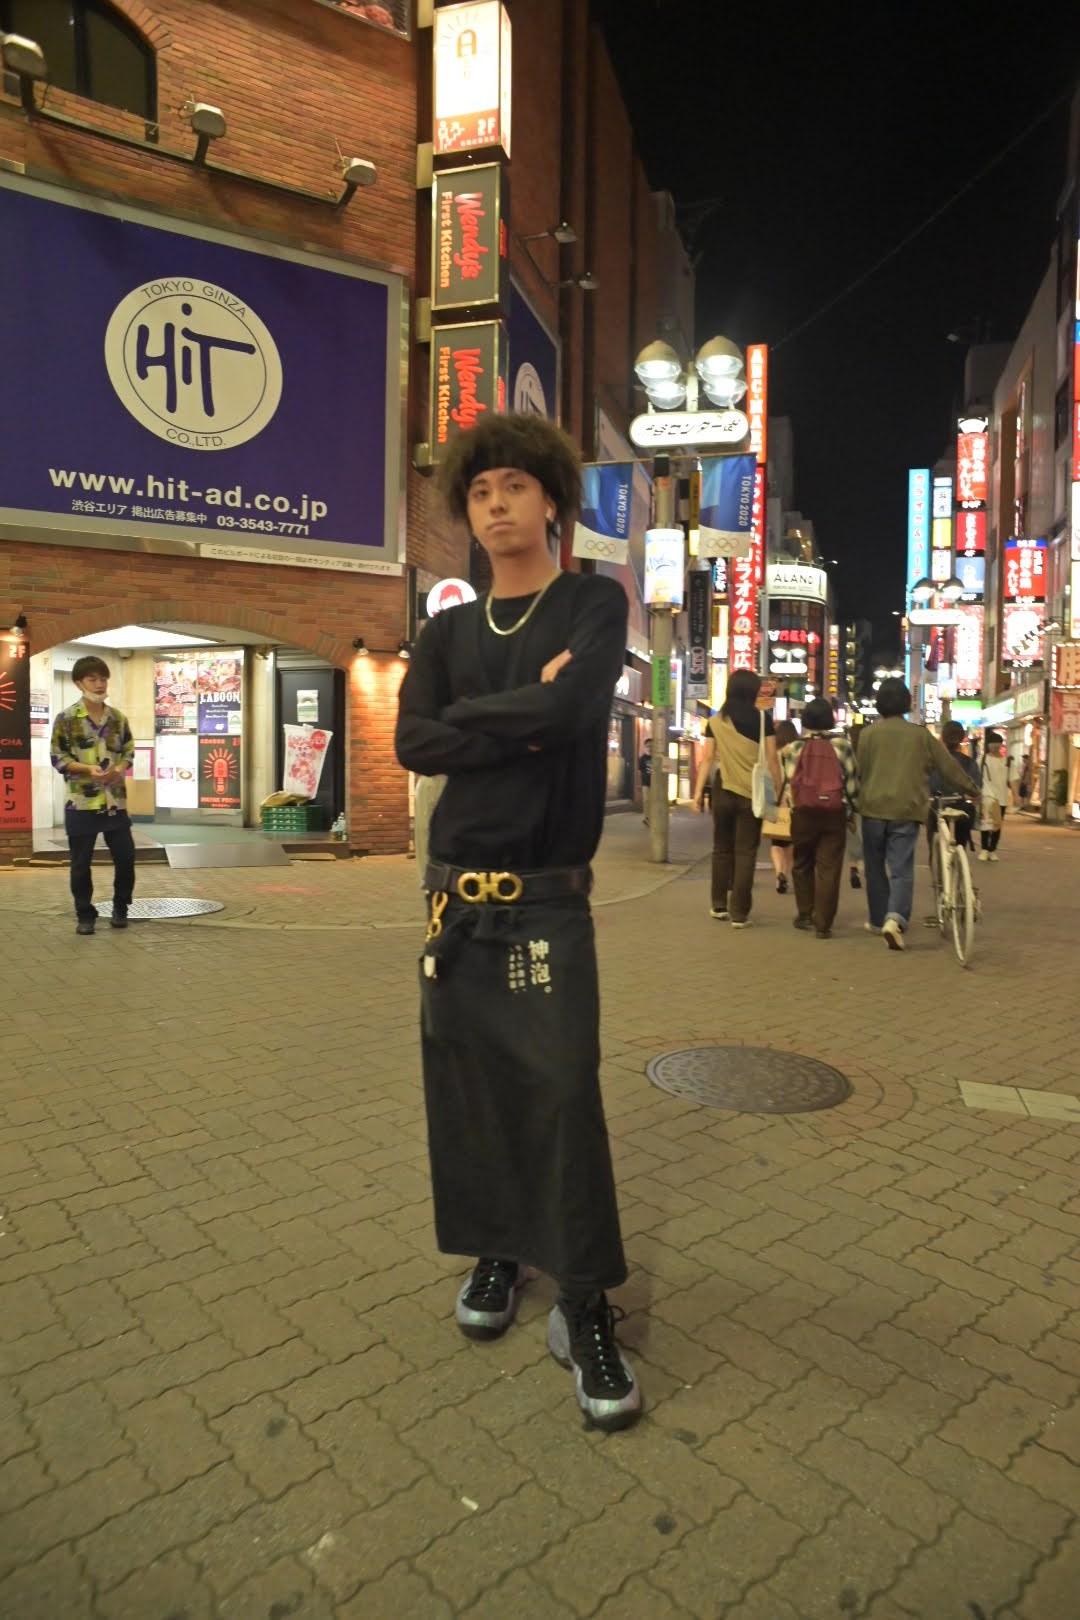 2020 4 Oct. Shibuya Center-Street_b0065255_22183053.jpg